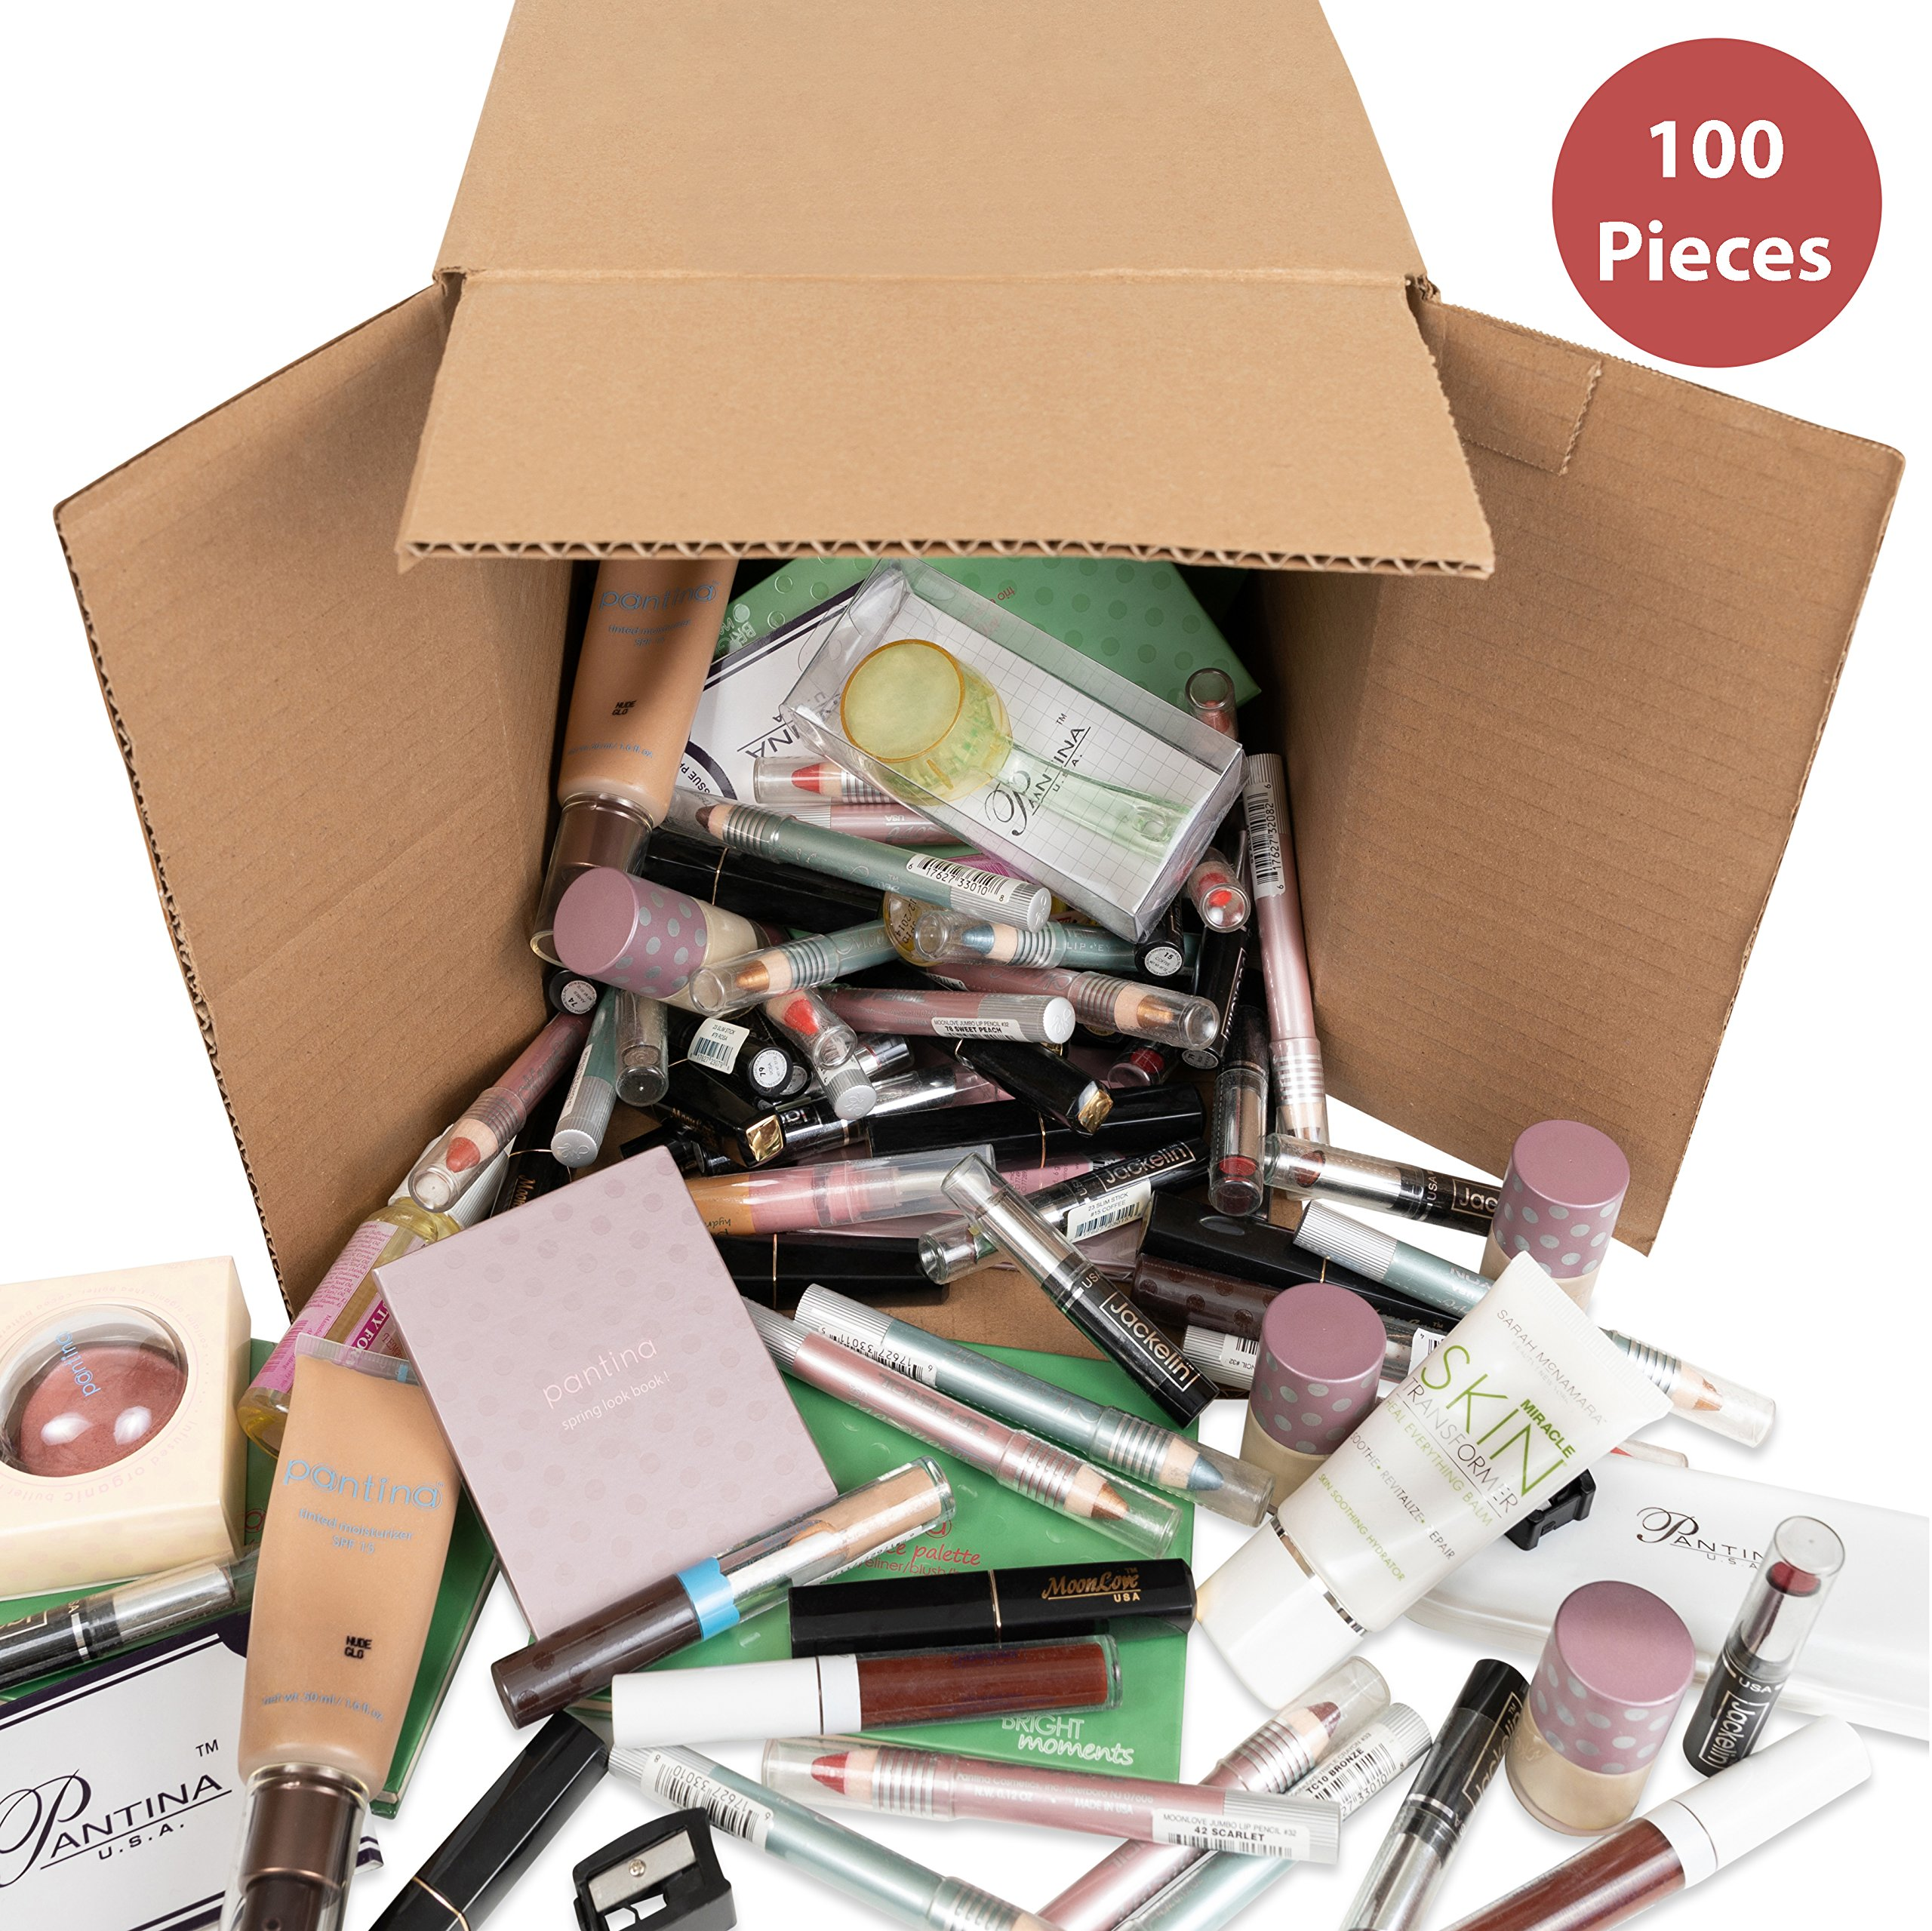 100-Piece Wholesale Bulk Makeup Assorted Cosmetics Box, Kit, Lot, Set, Kids, Girls, Women, Party Favors, Cheap, Gift, Birthday by Truscope (Image #1)